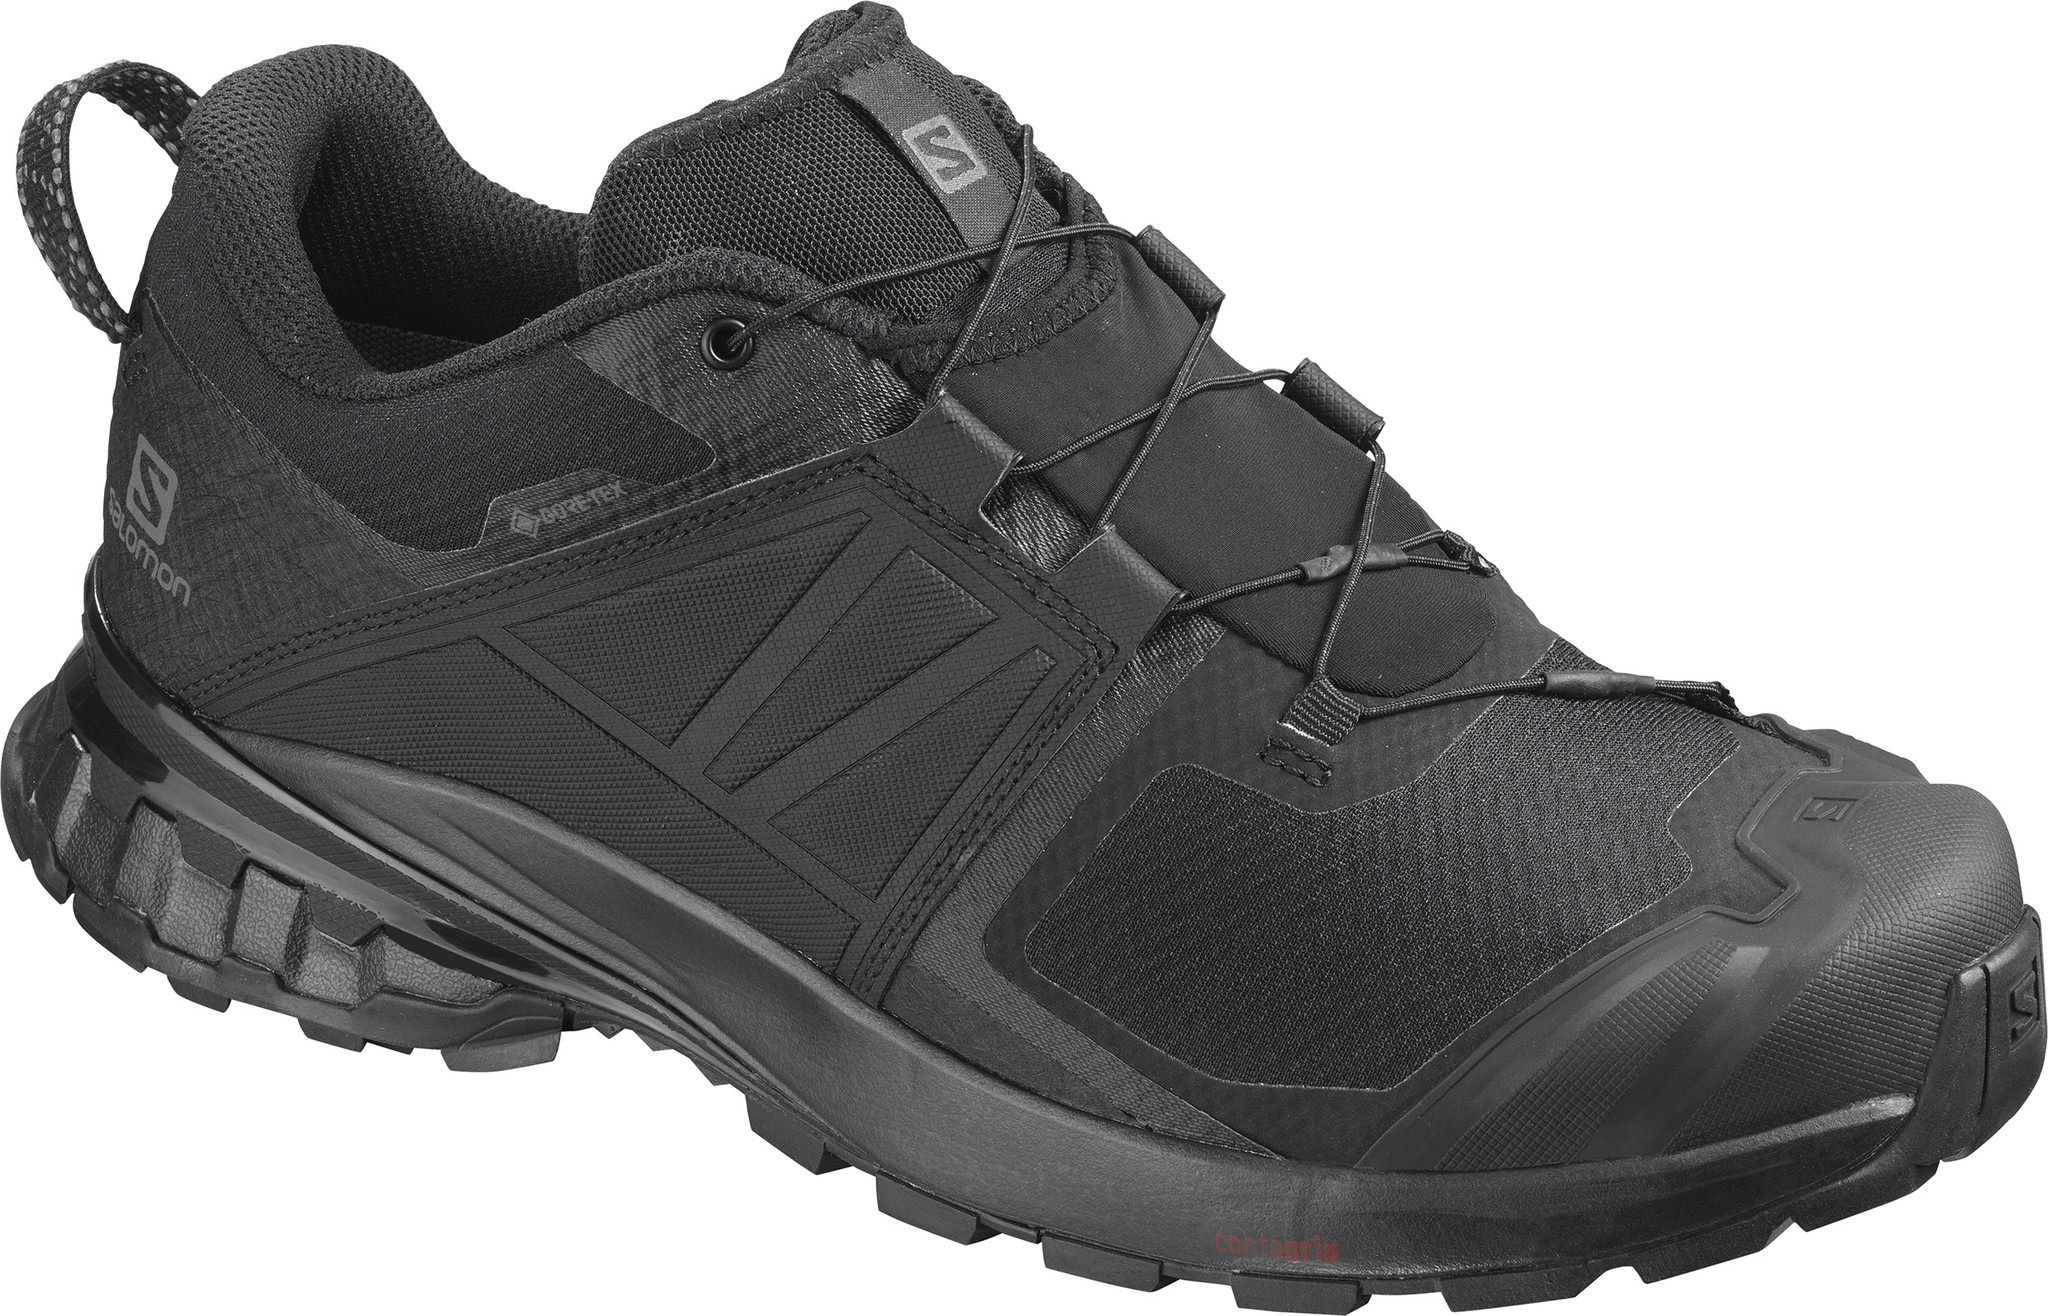 Salomon XA Wild Women's Trail Running Shoes